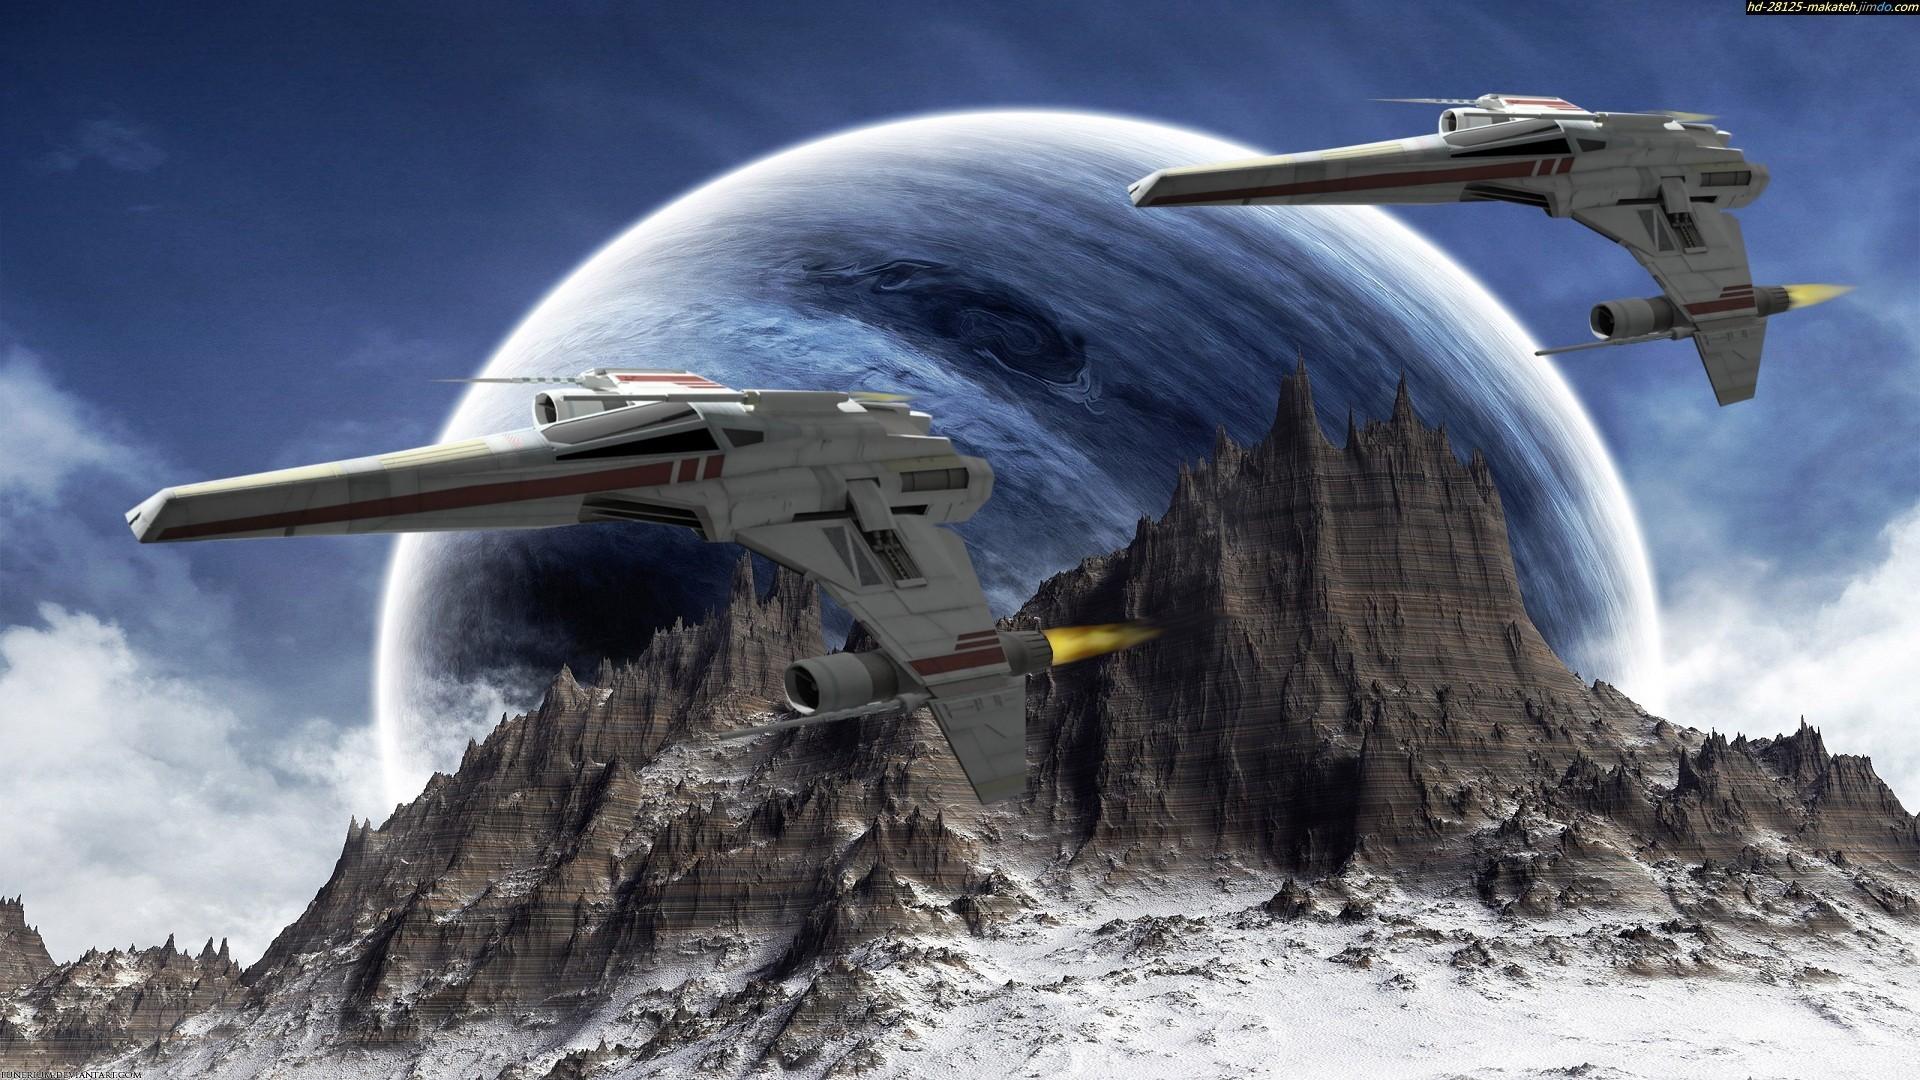 Planets Raumschiffe Science Fiction Sci Fi wallpaper 1920x1080